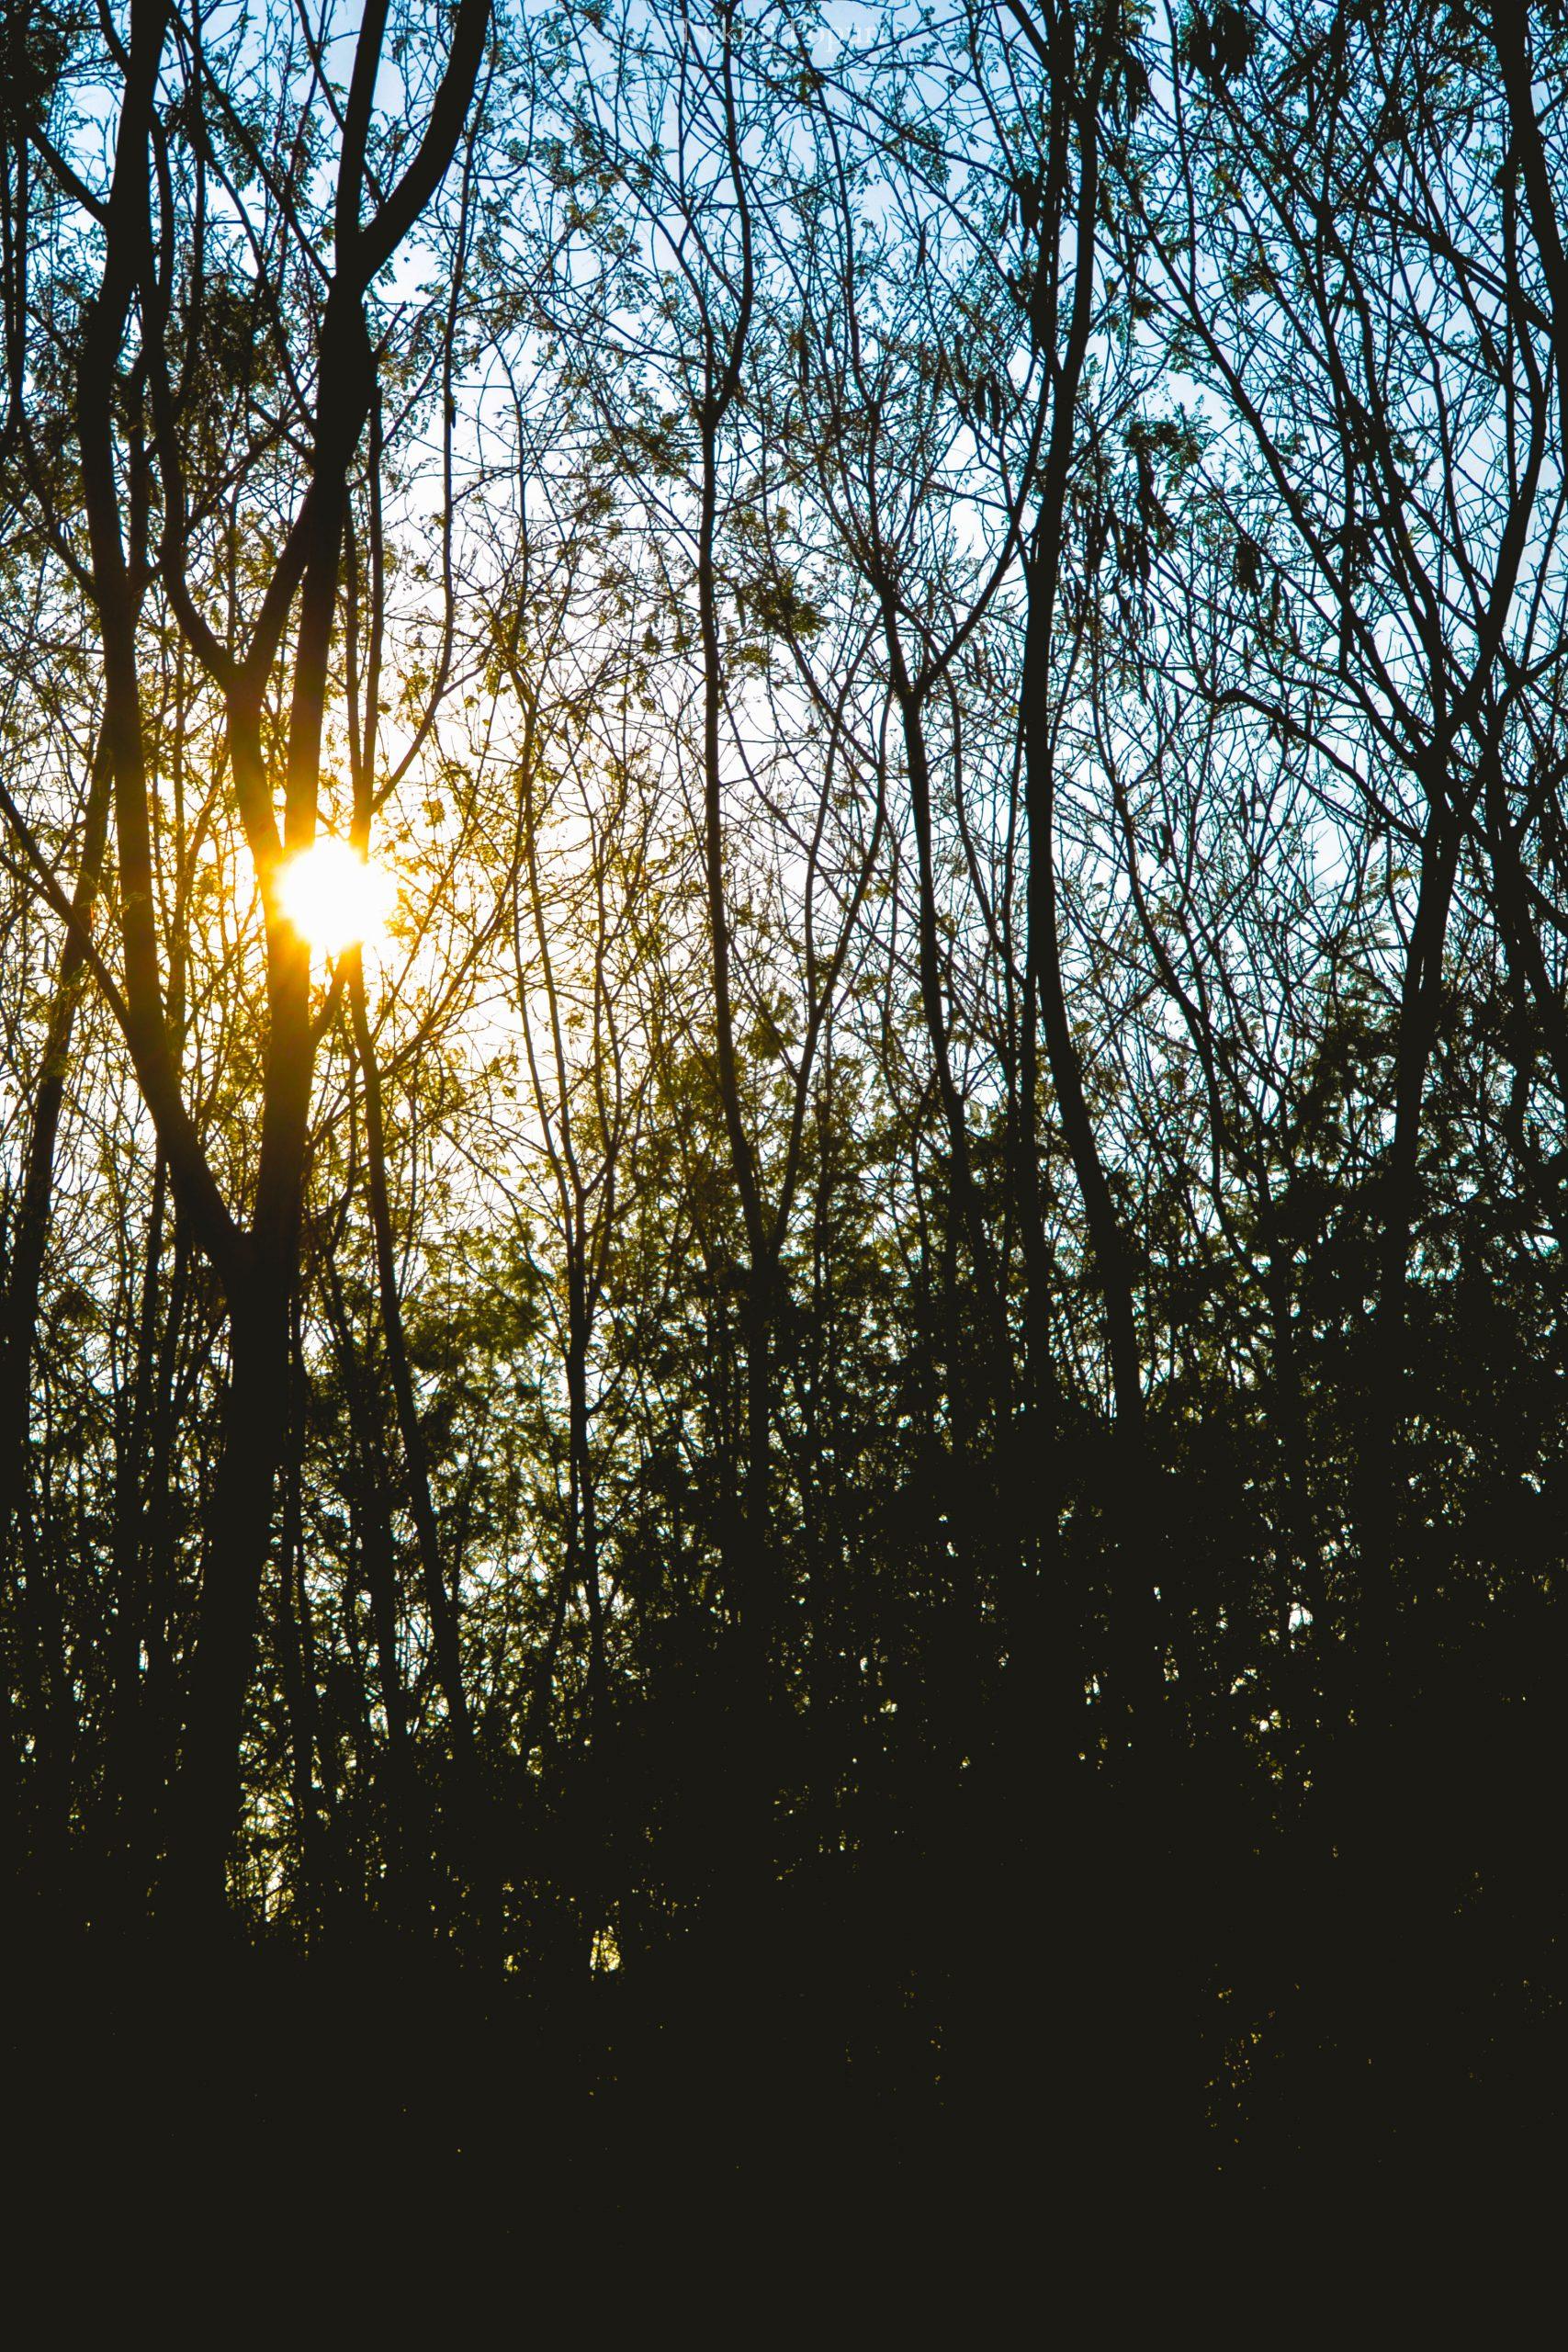 Sun shine through trees